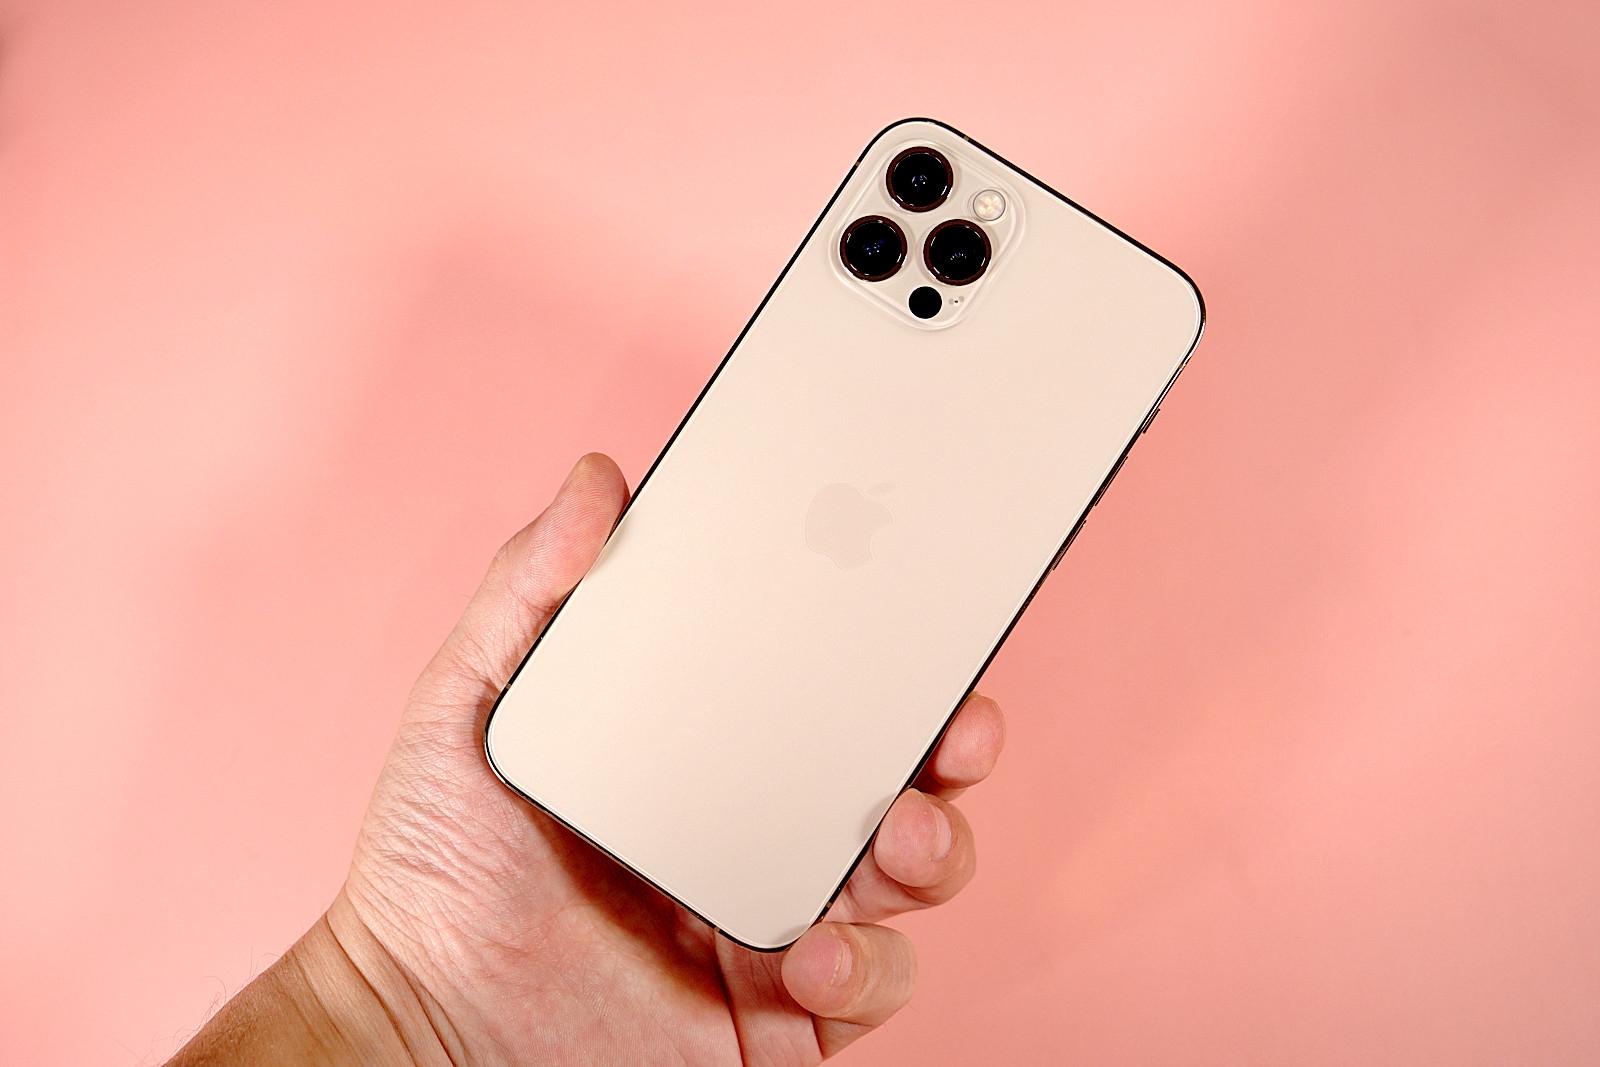 iPhone12信号差原因:基带不背锅 苹果网络调试不充分